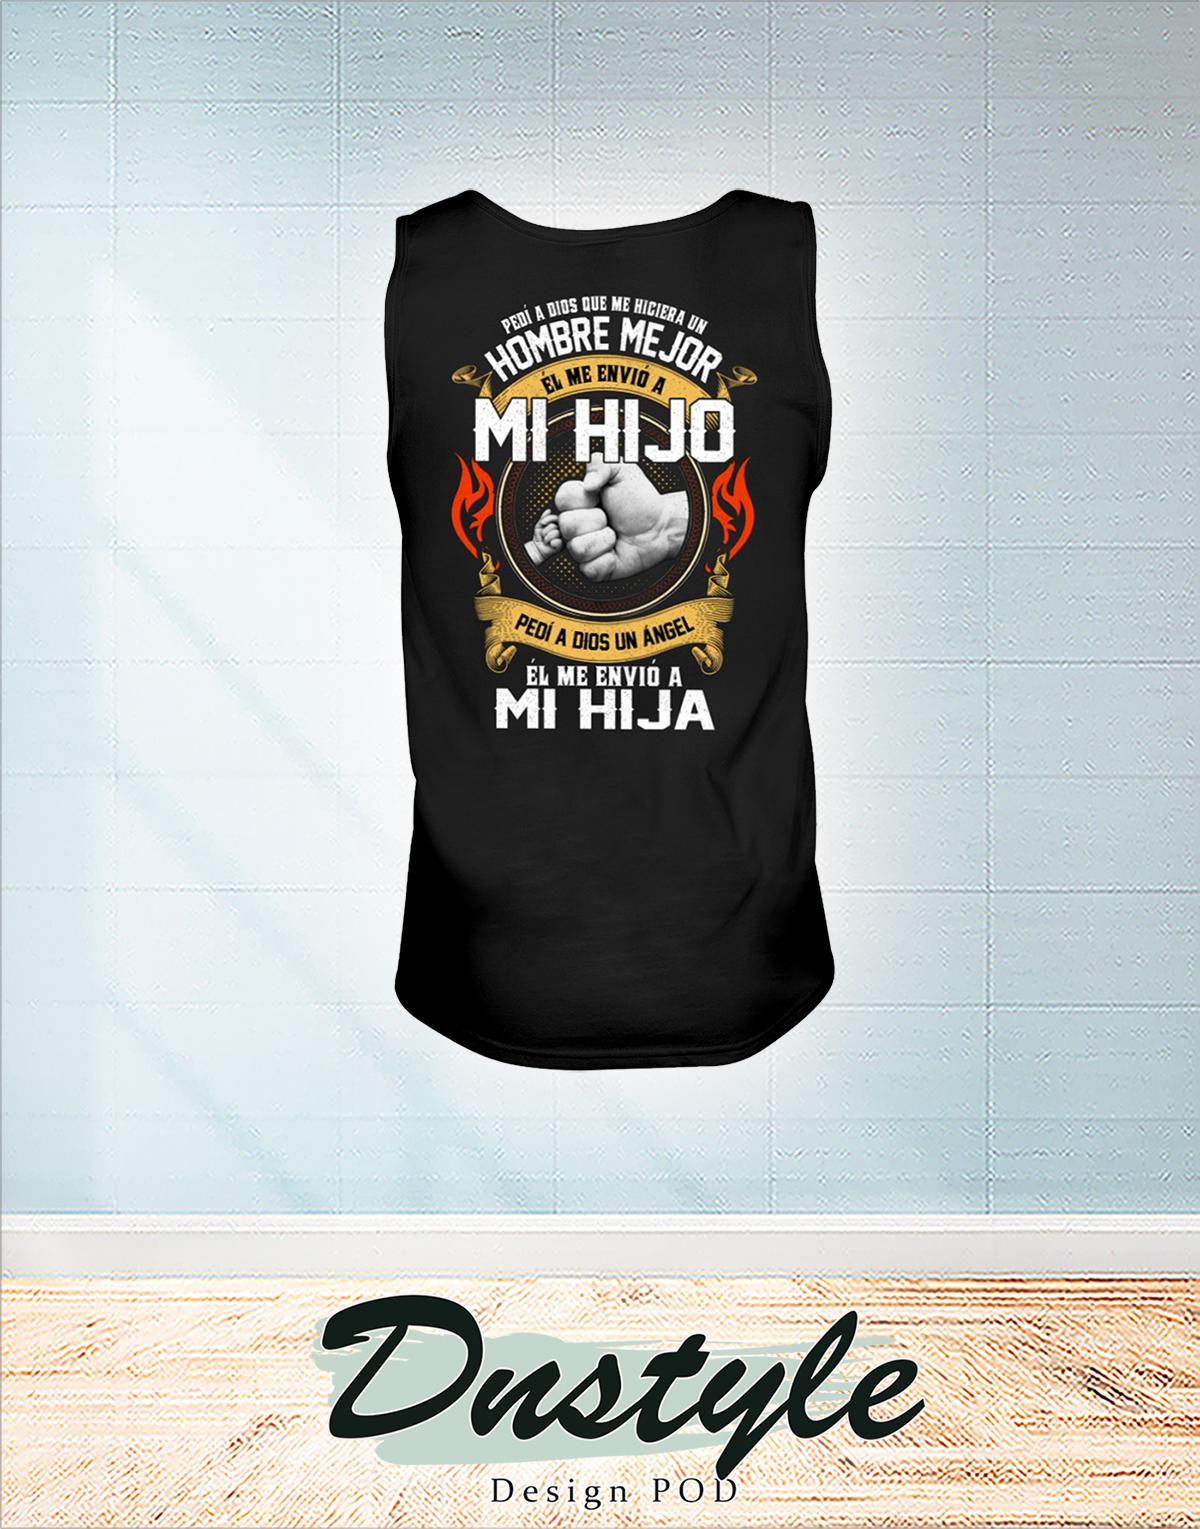 Camisetas sublimadas hombre mejor para papa tank